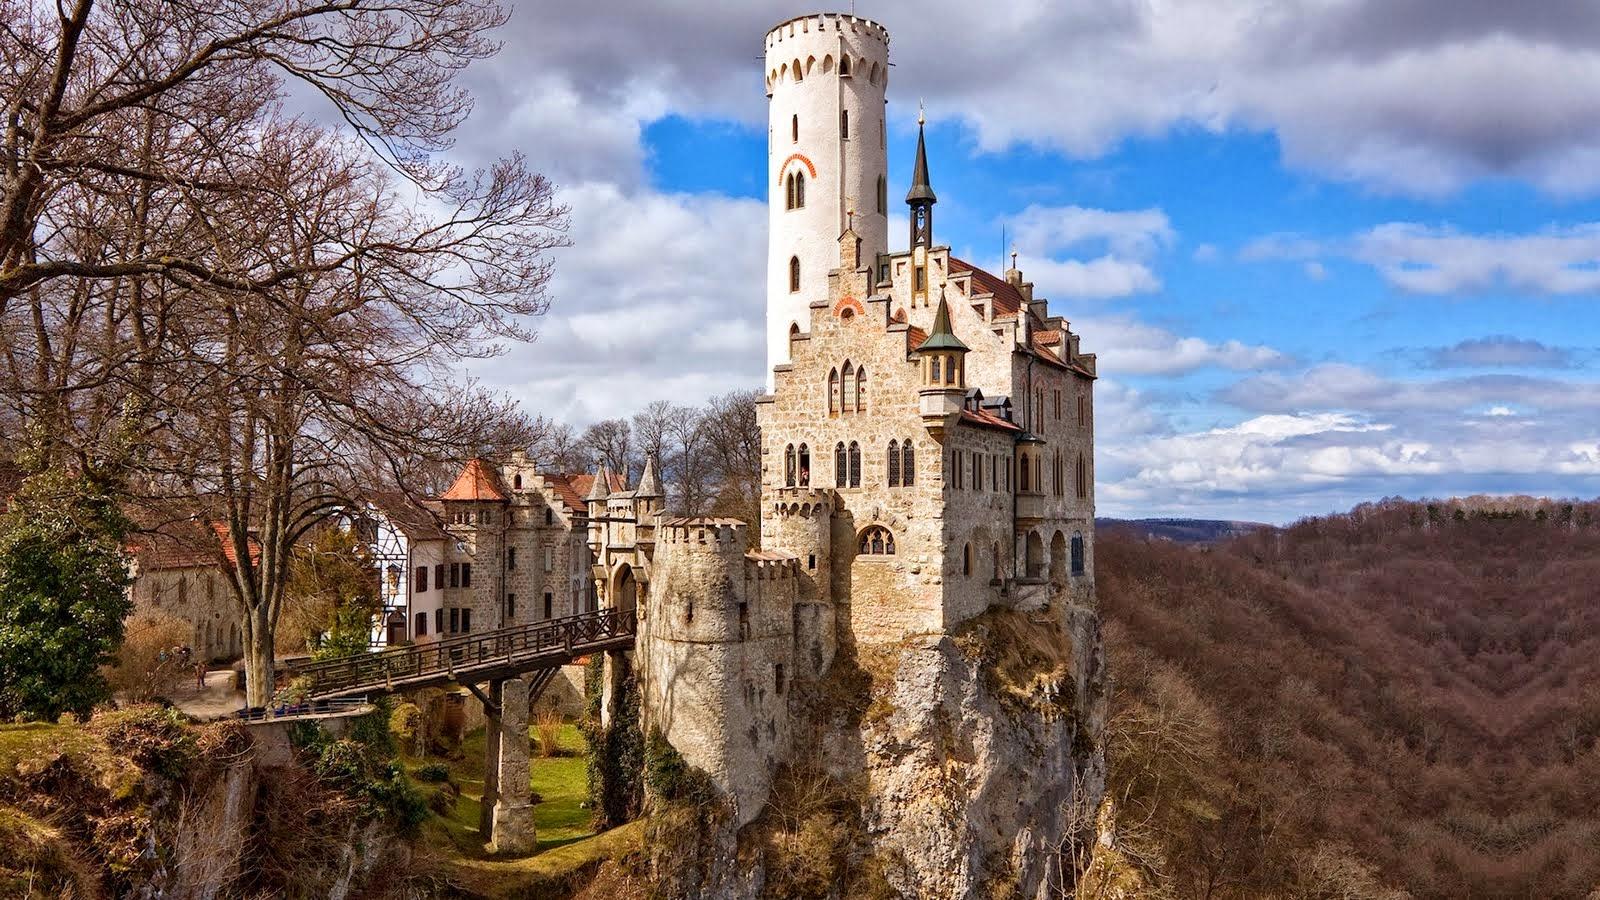 47 Hd Castle Wallpapers On Wallpapersafari